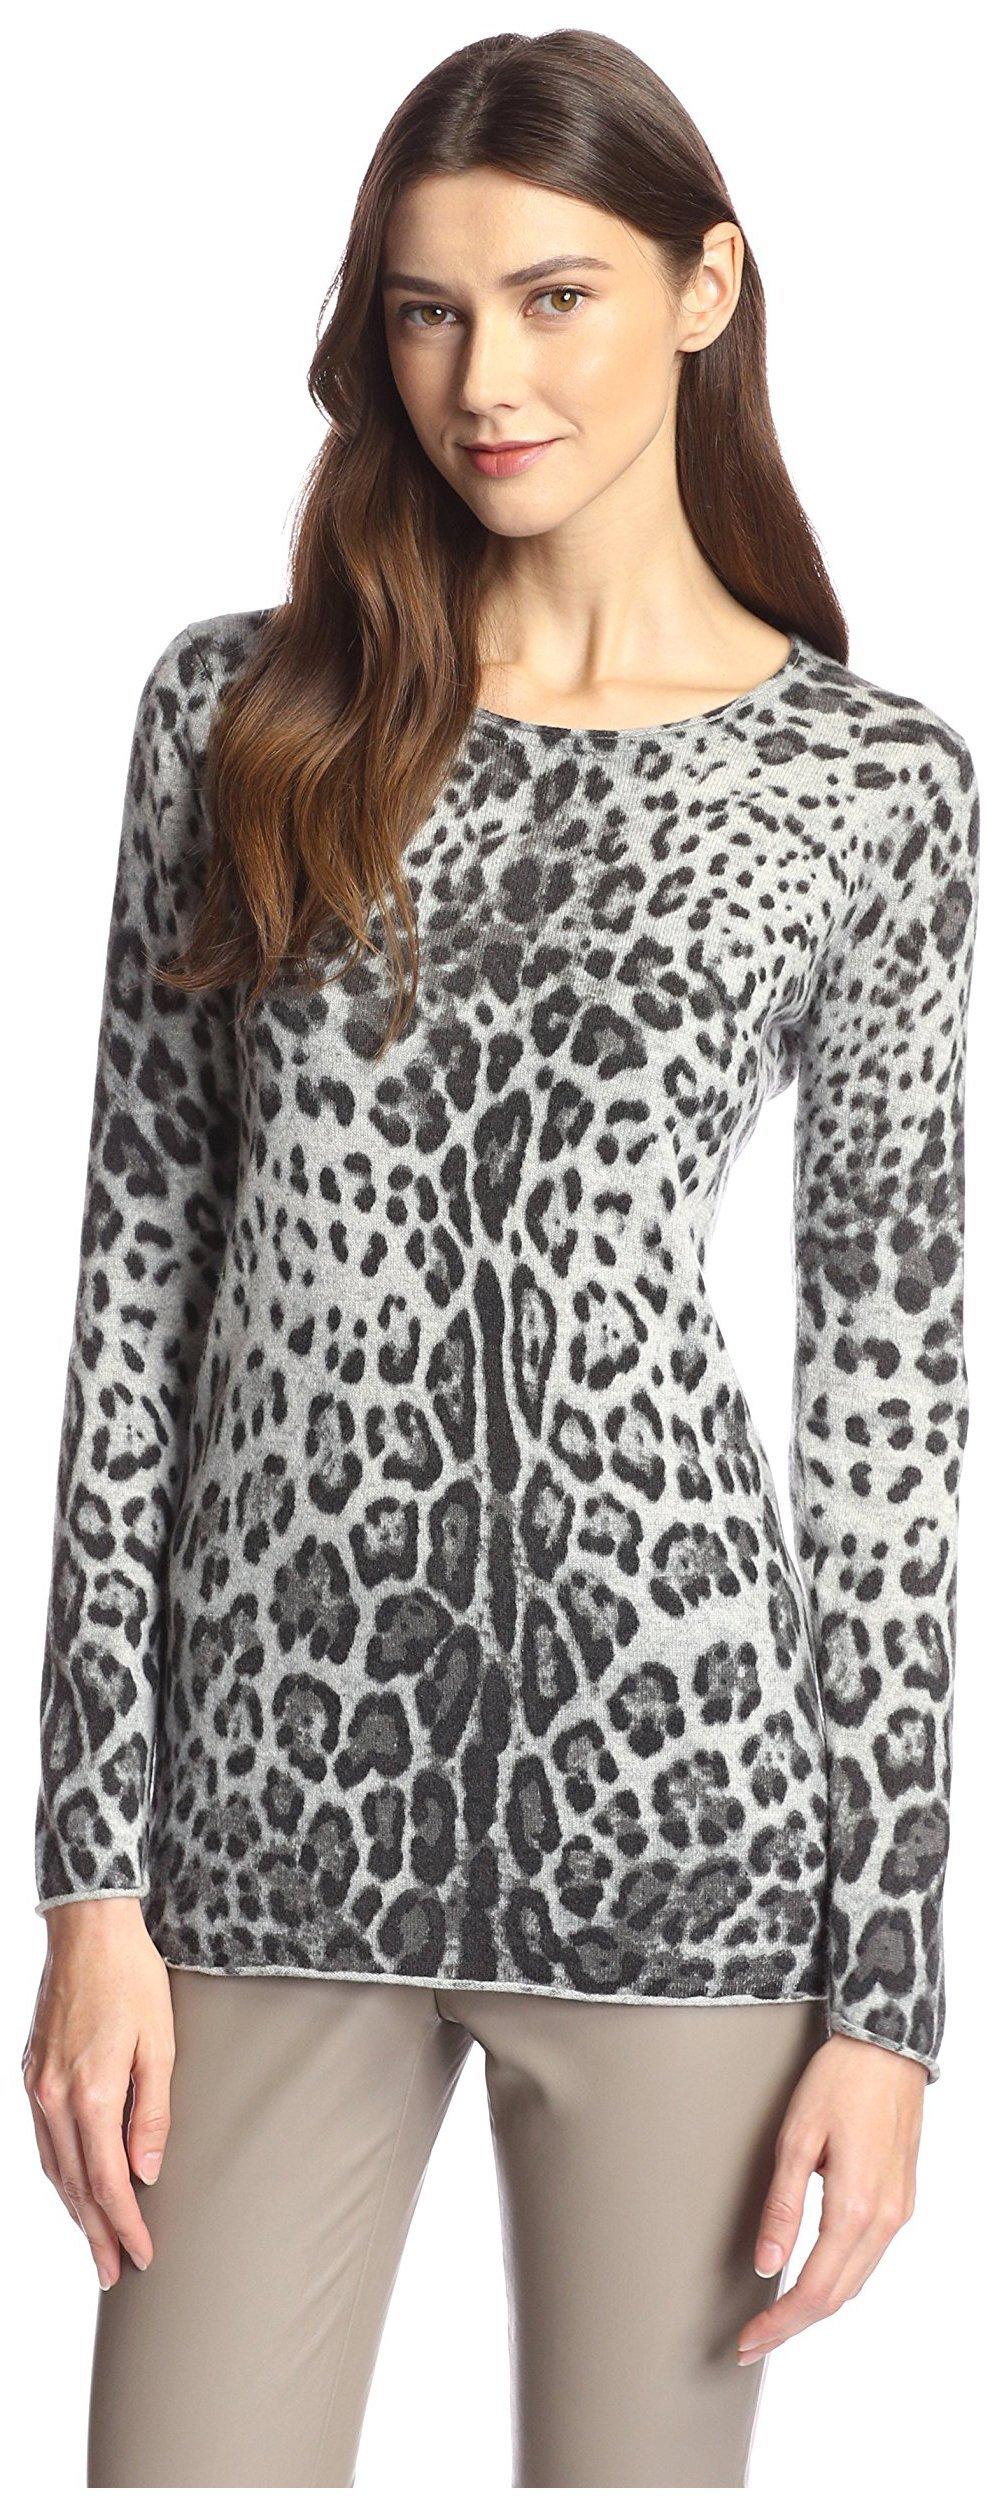 James & Erin Women's Cashmere Leopard Print Tunic, Grey Multi, S